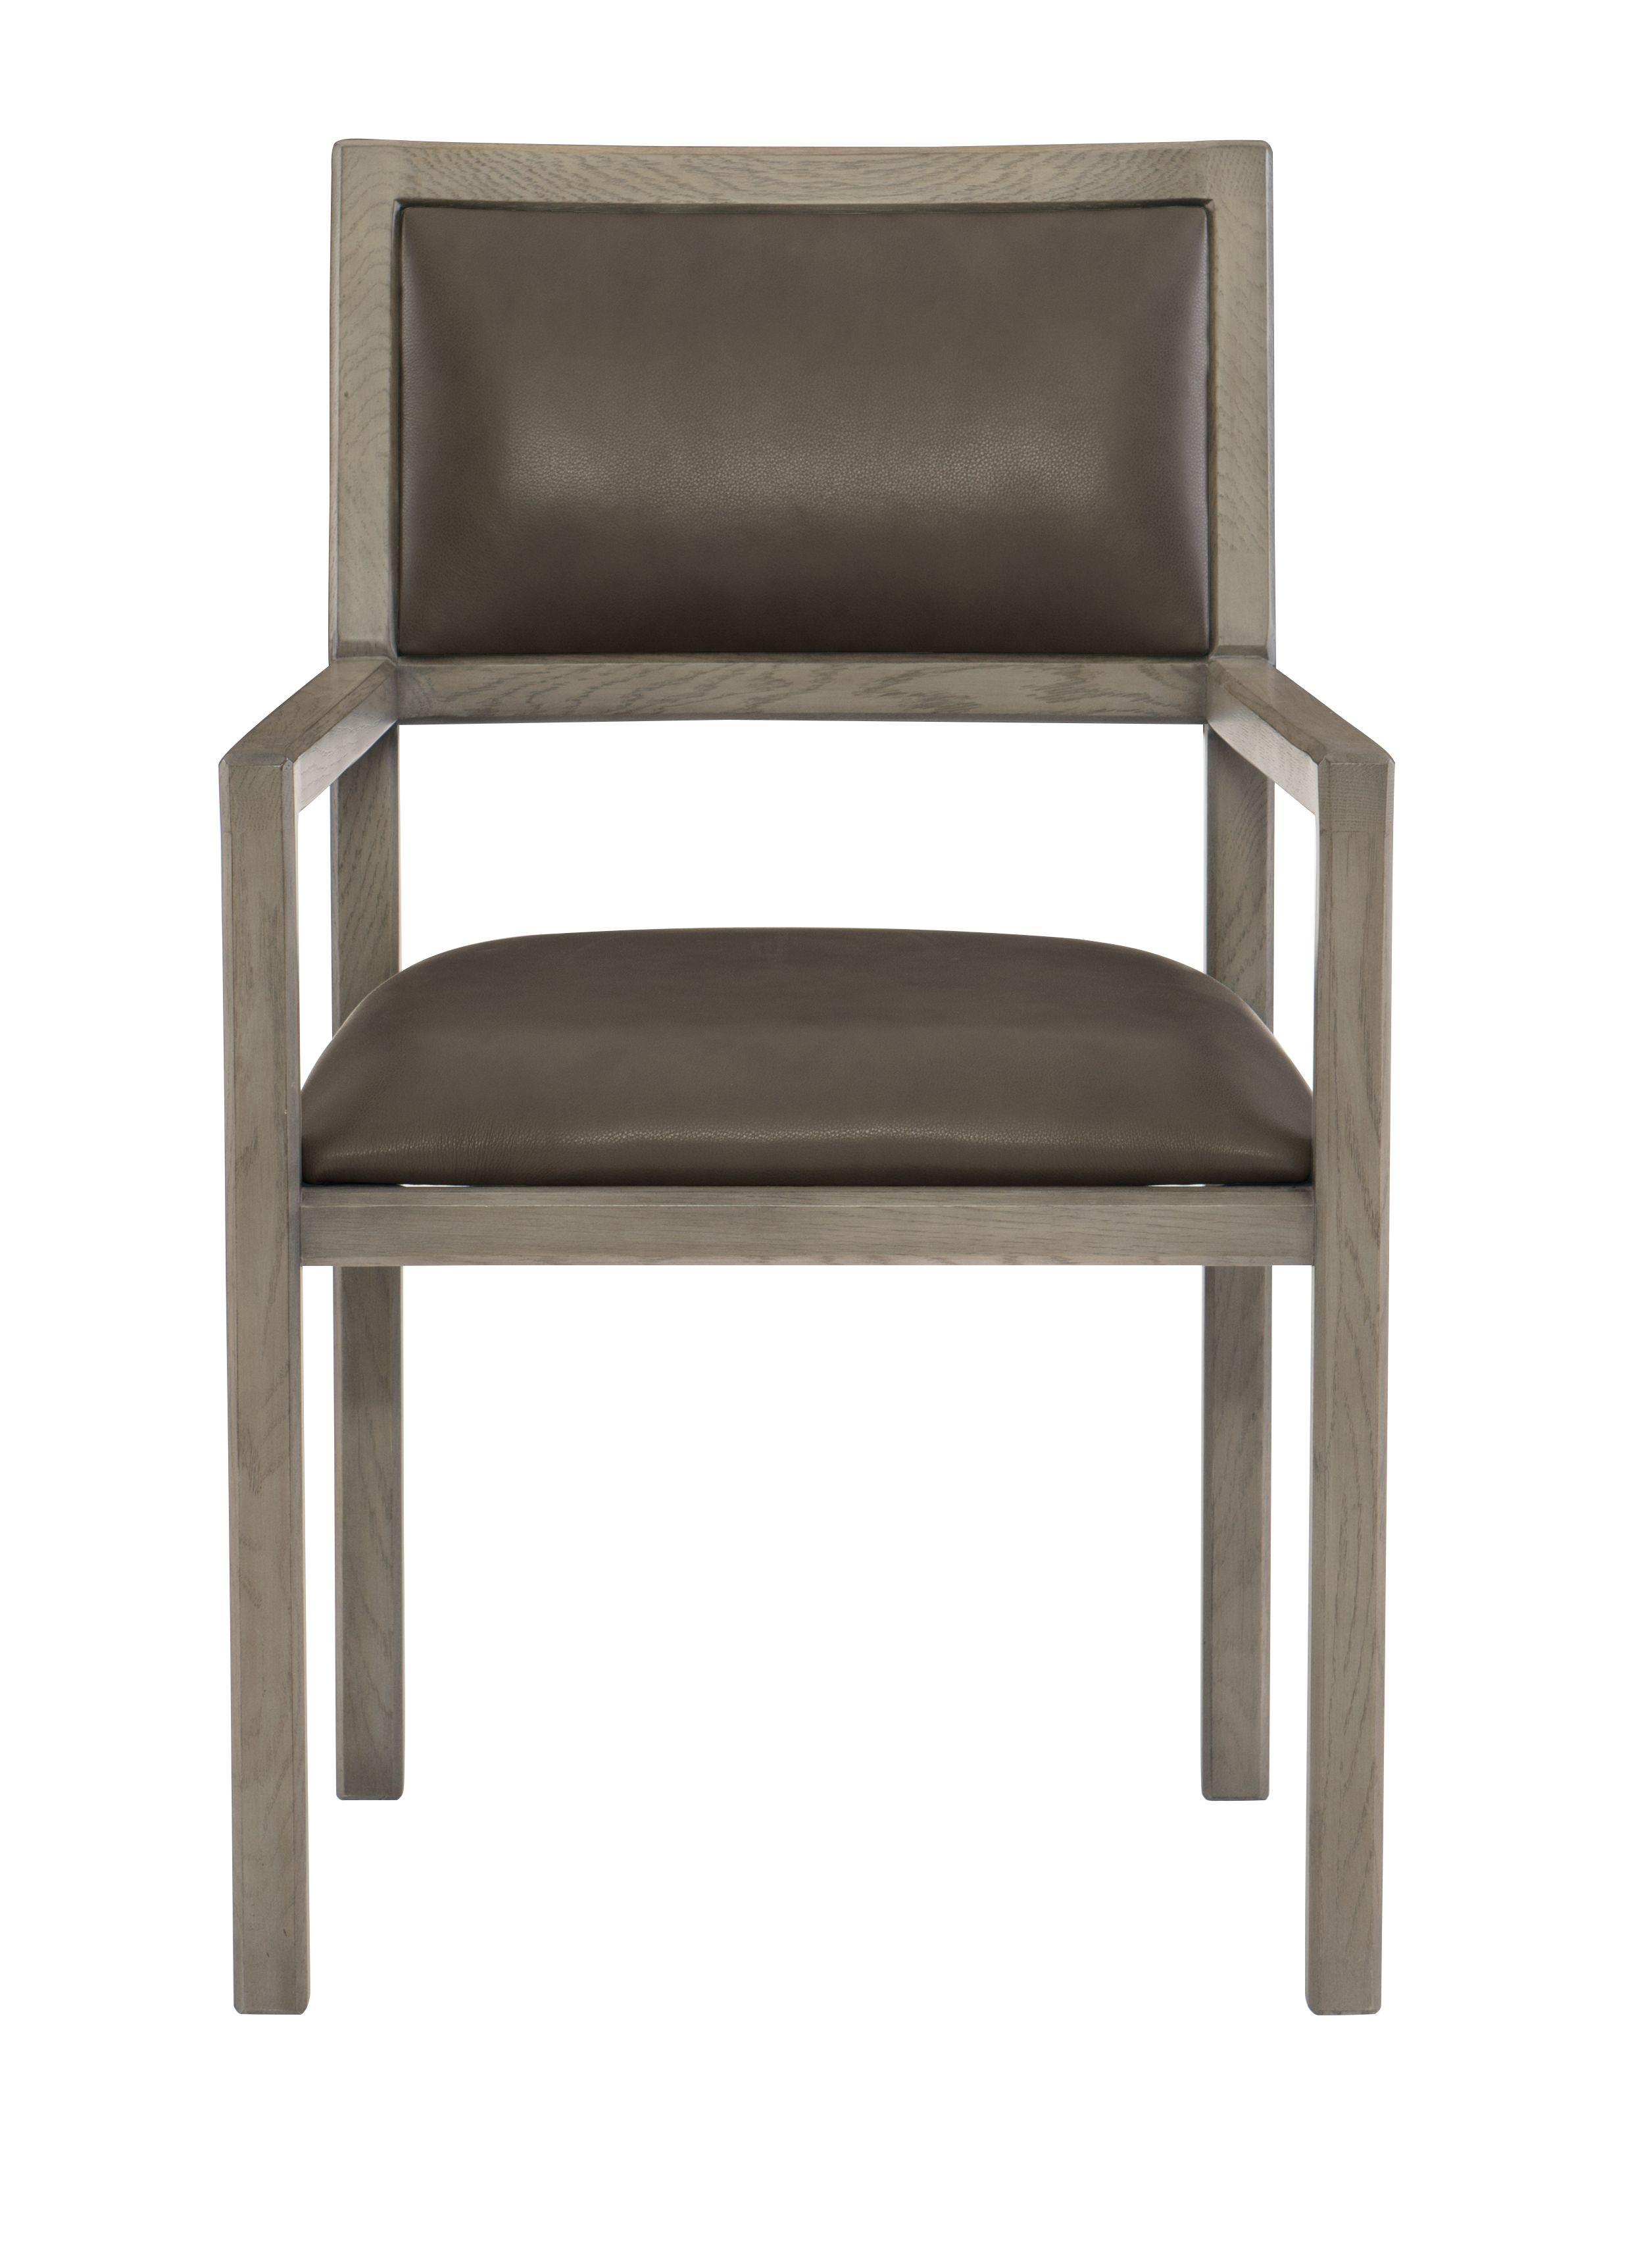 Bernhardt Interiors Mitcham Leather Dining Chair In 2020 Dining Chairs Furniture Leather Dining Chairs